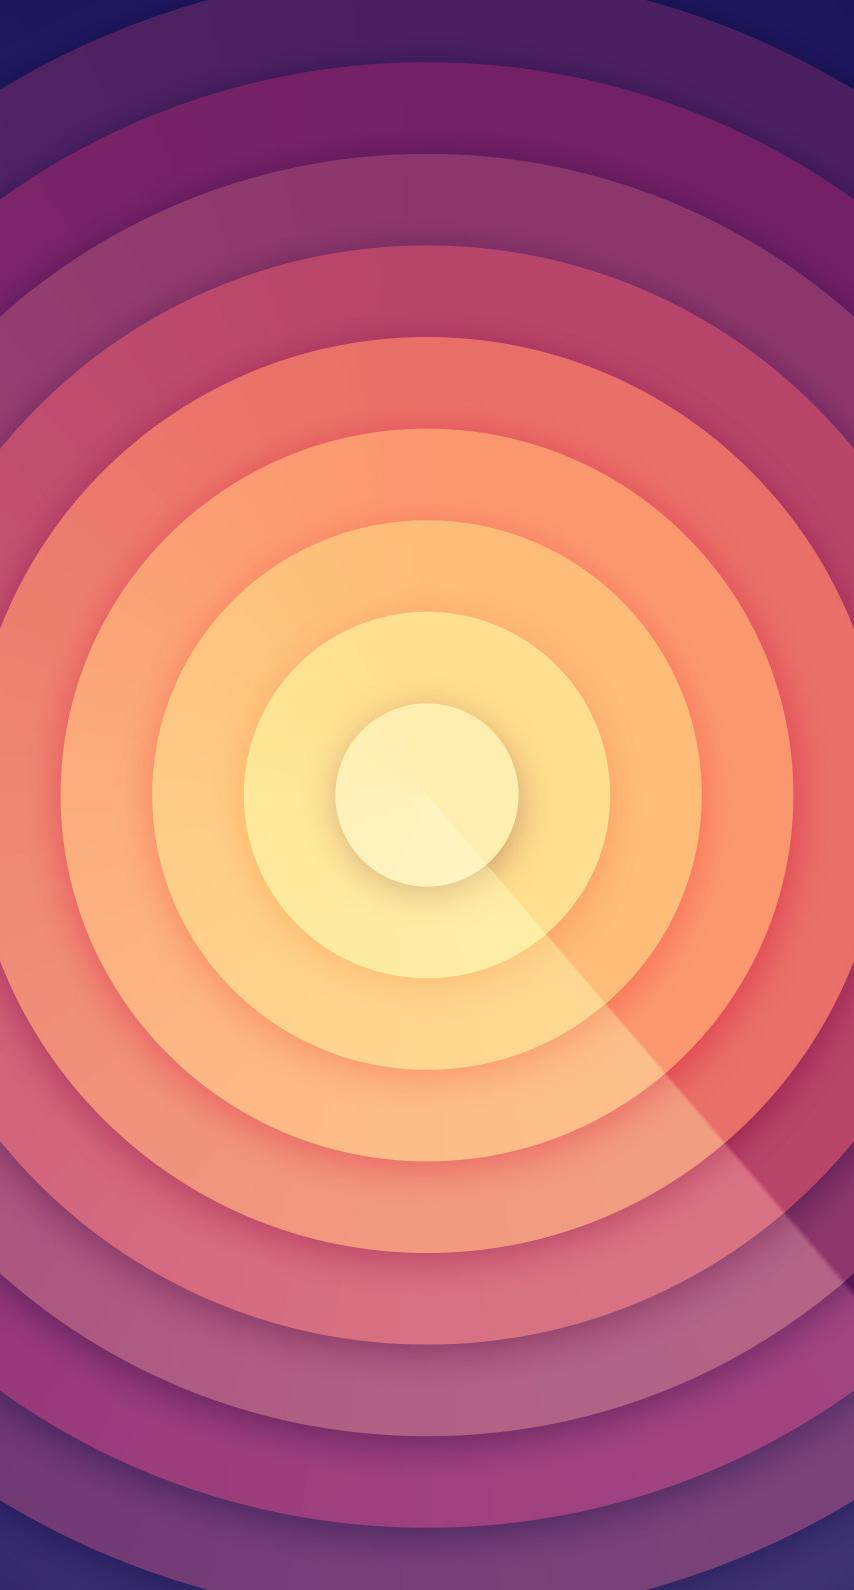 vector, image